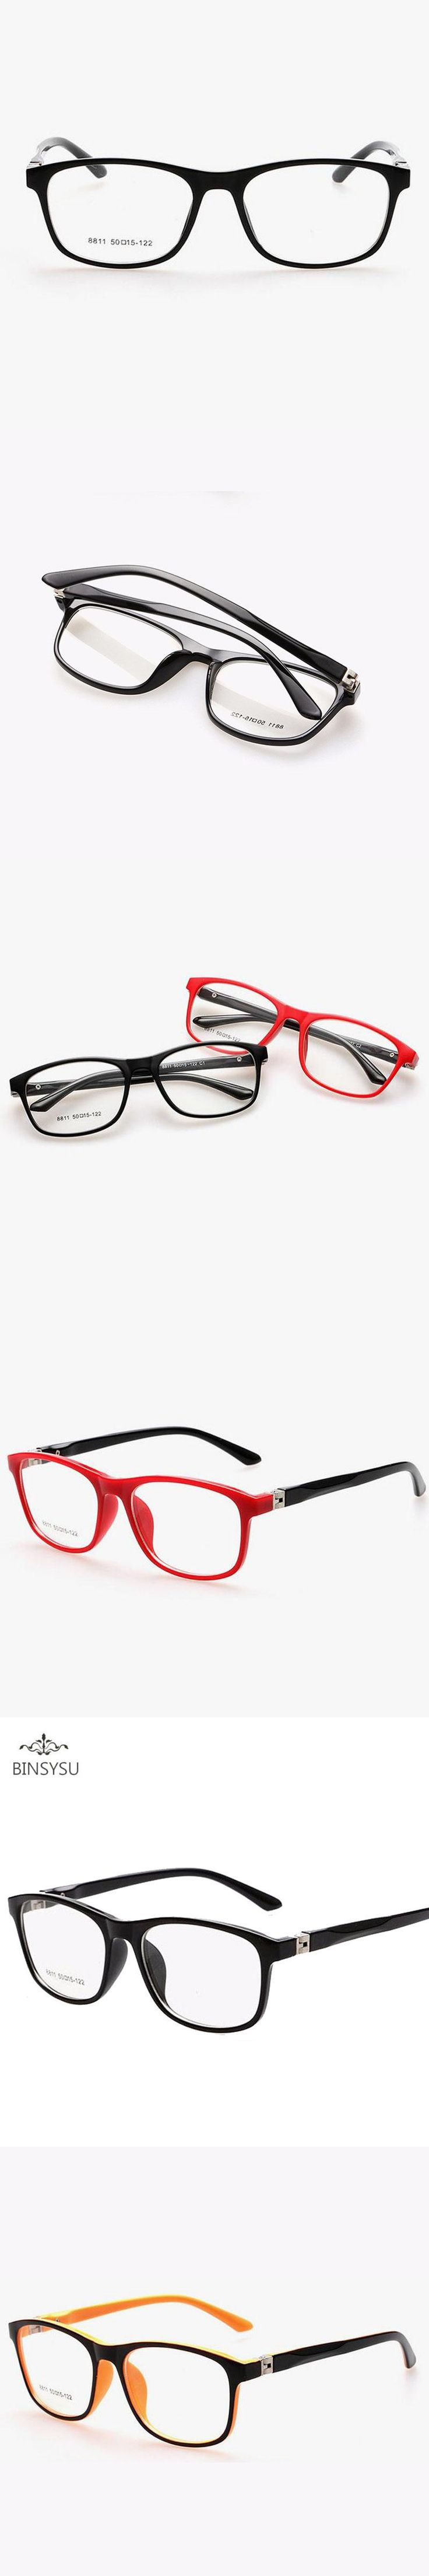 TR90 children optical frame eyewear wholesale eyeglasses 7 colors Double Color New Style Girls Boys Kids Glasses big Frame 8811